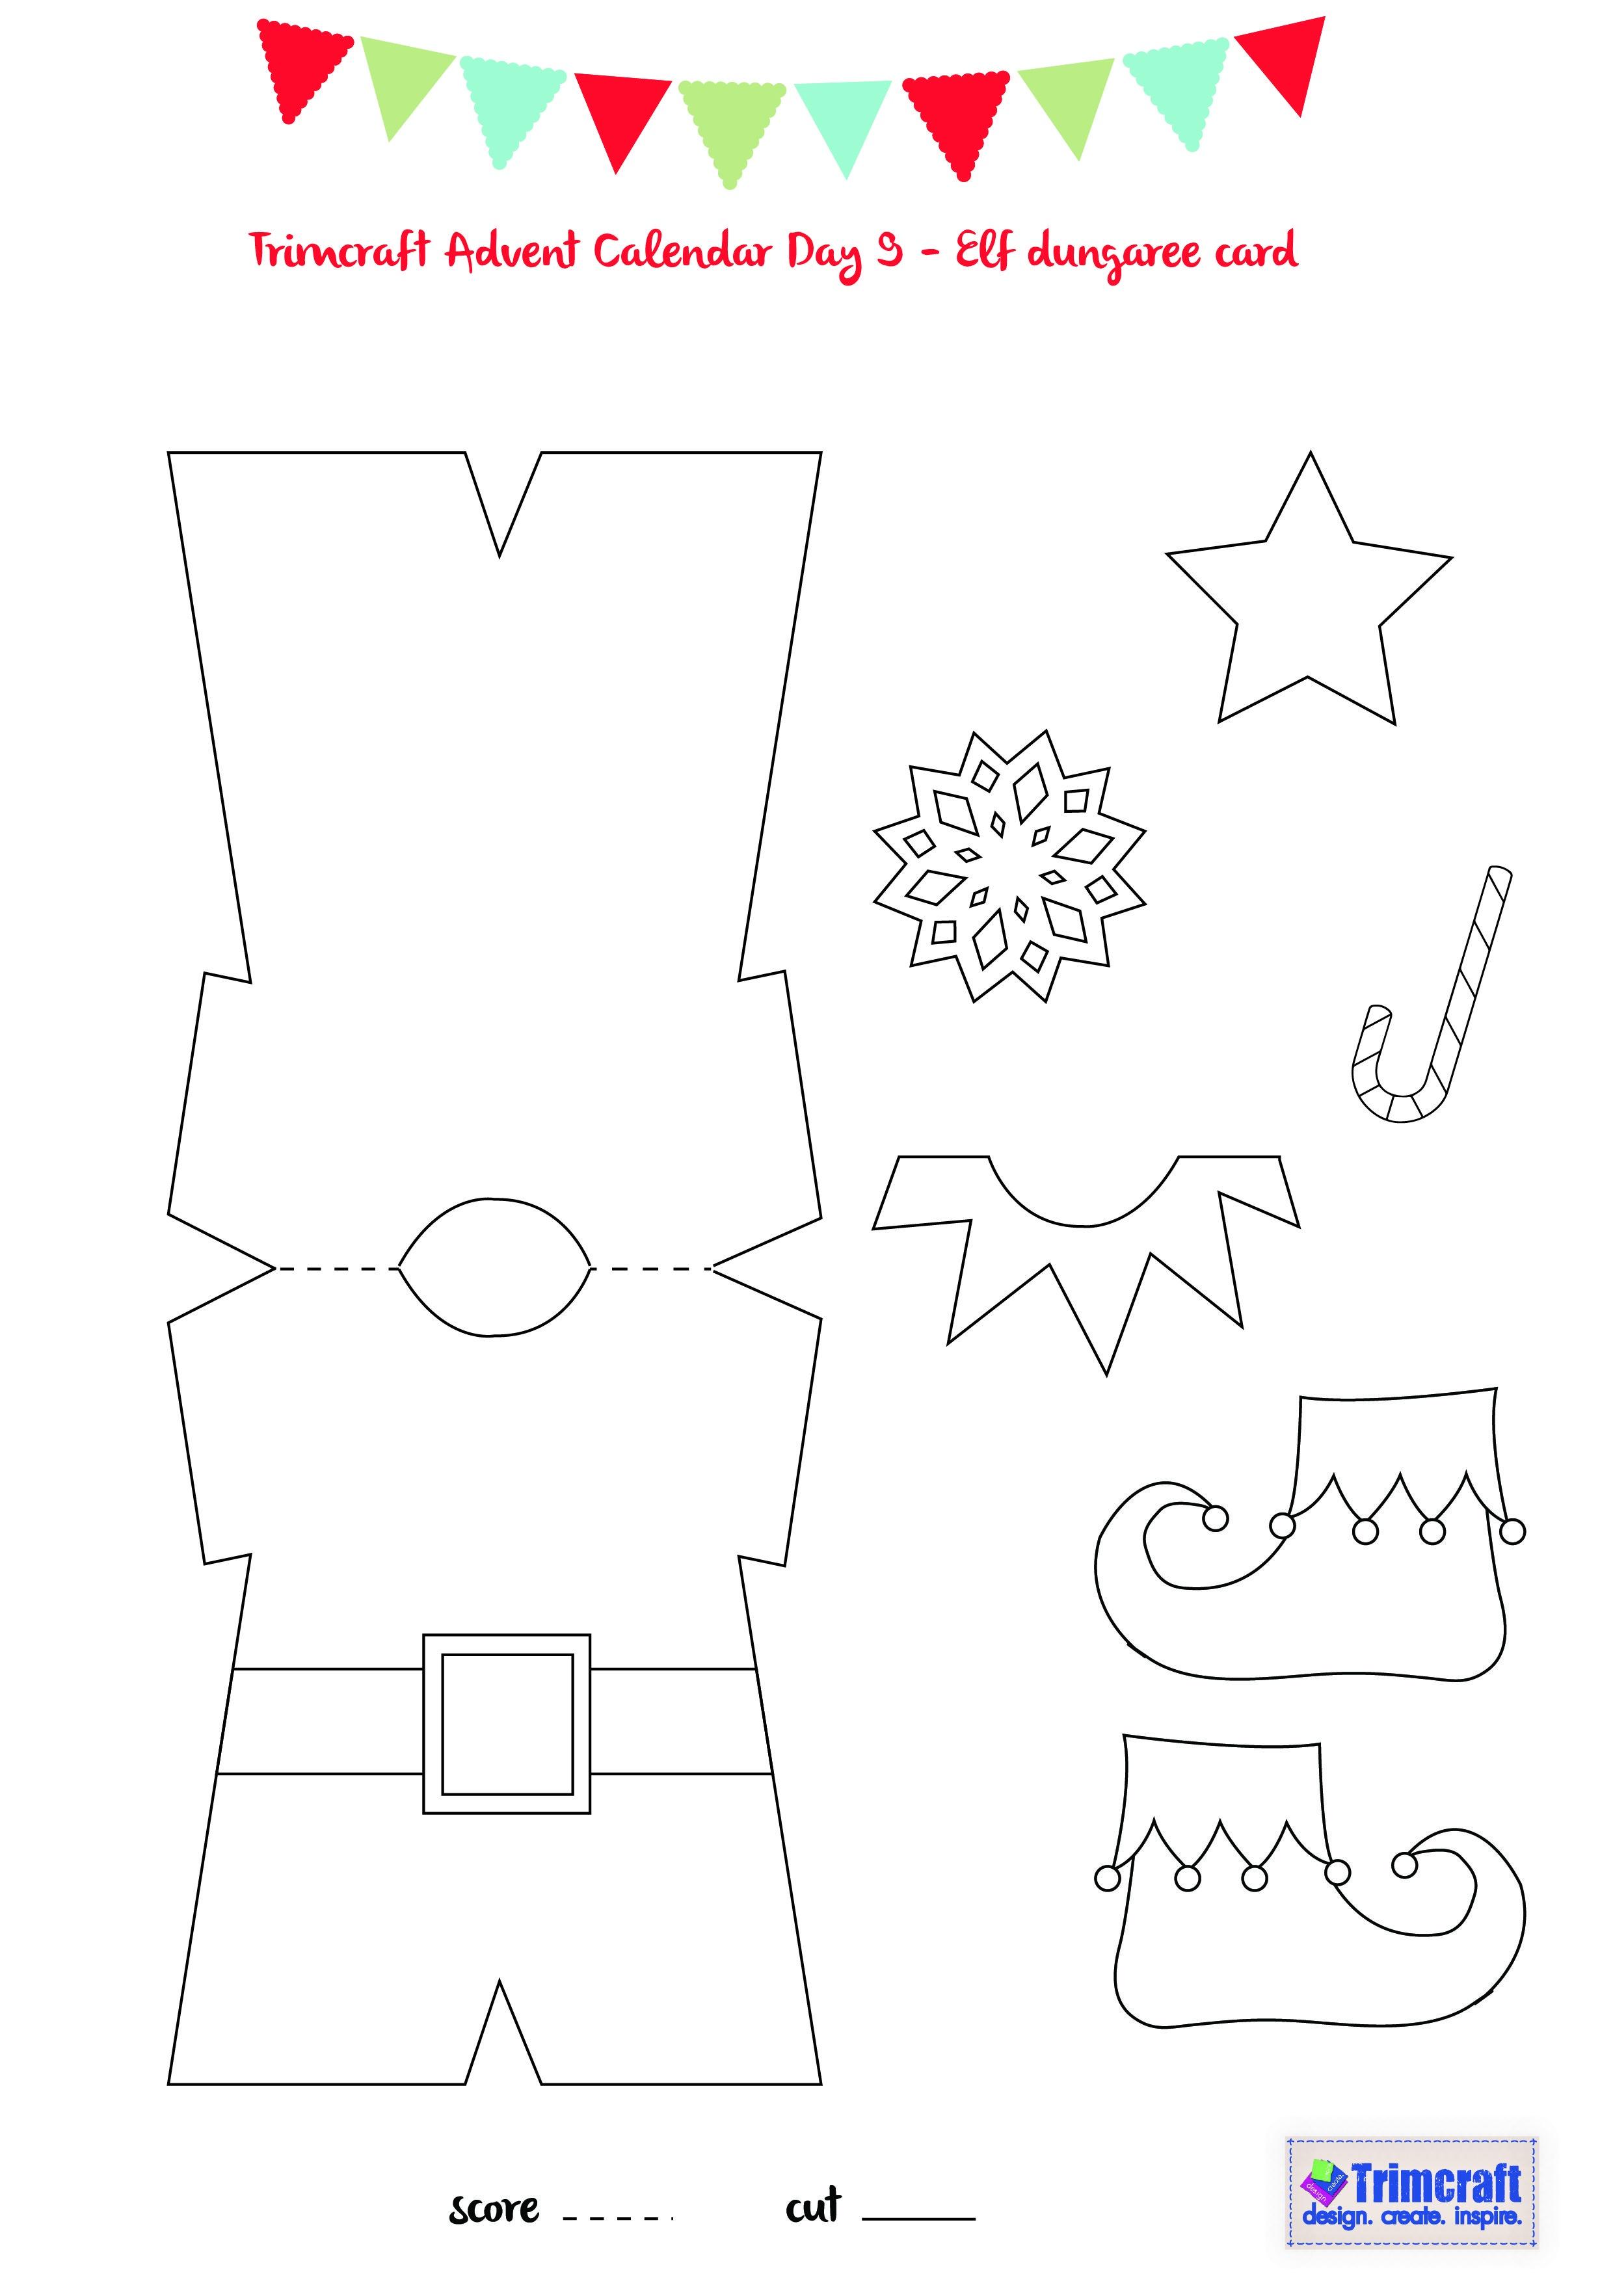 Trimcraft Advent Calendar Day 9 - Elf Card Template | Winter - Free Printable Elf Pattern